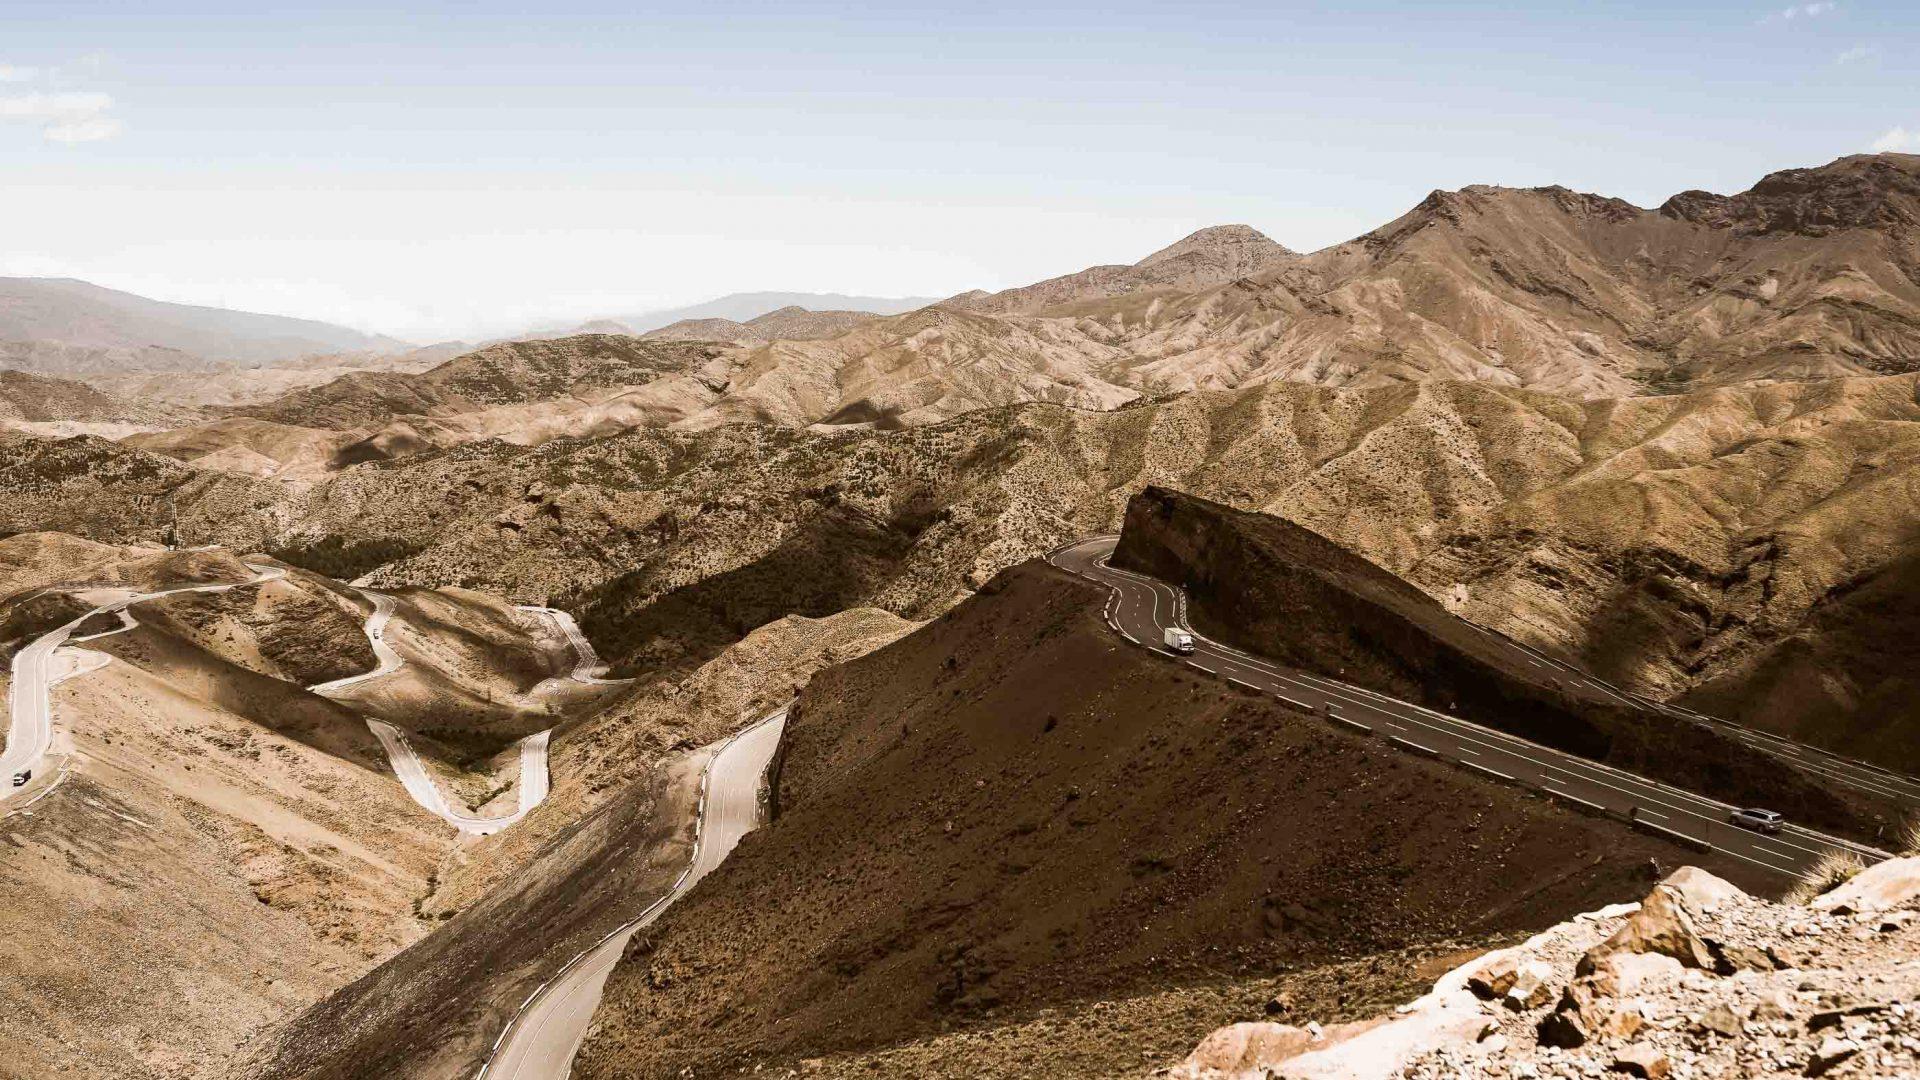 A winding road through an arid landscape.